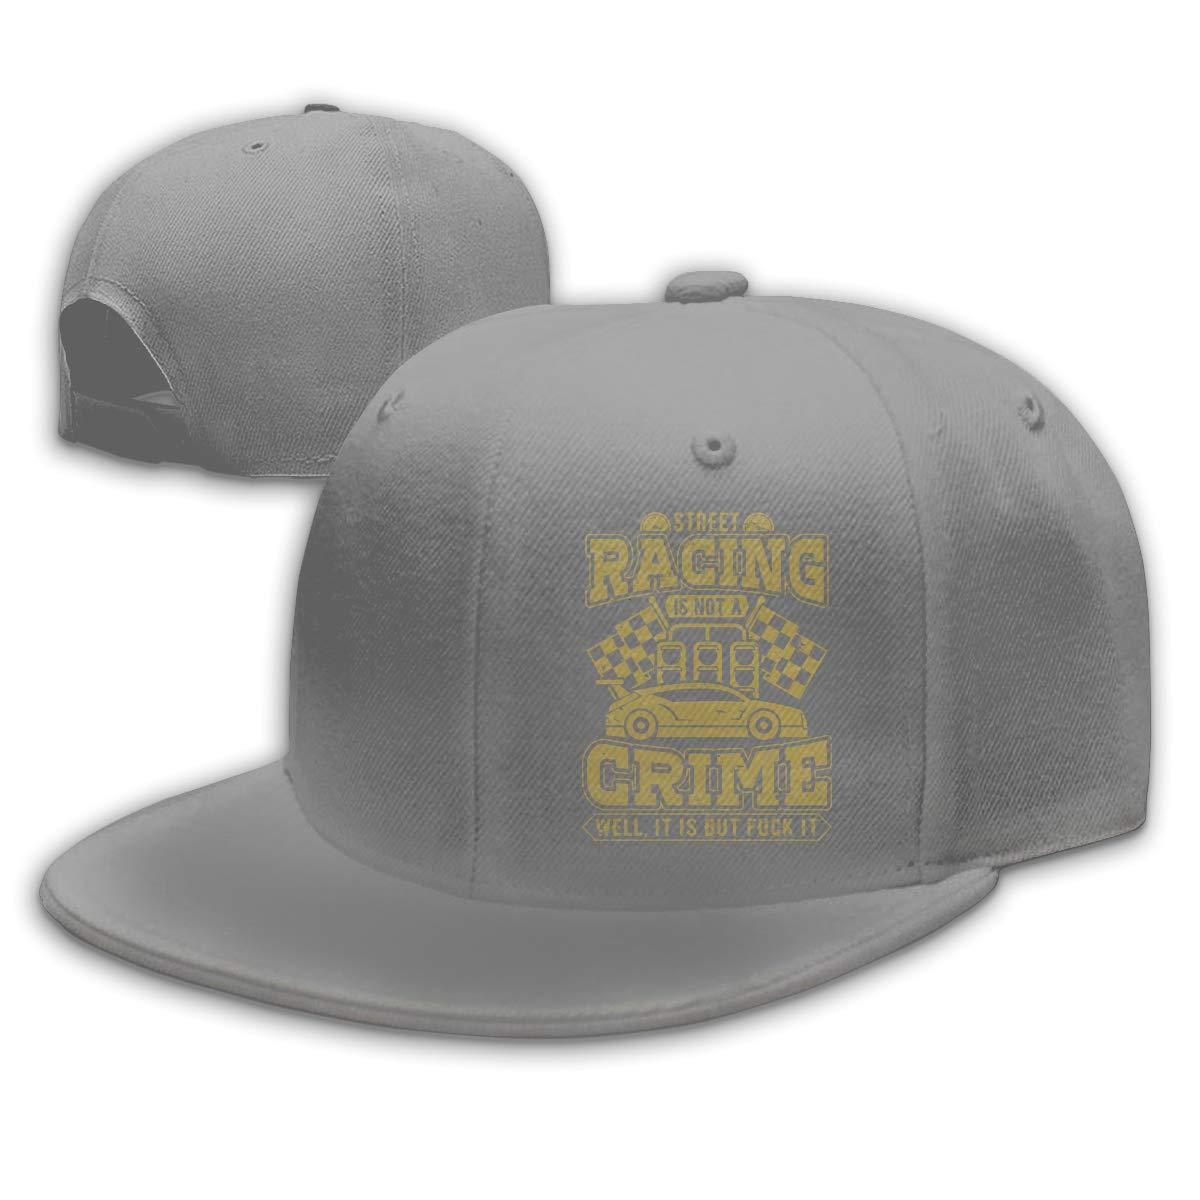 acbf67f13 Street Racing is Not A Crime Baseball Cap Flat Hat Unisex Snapback ...